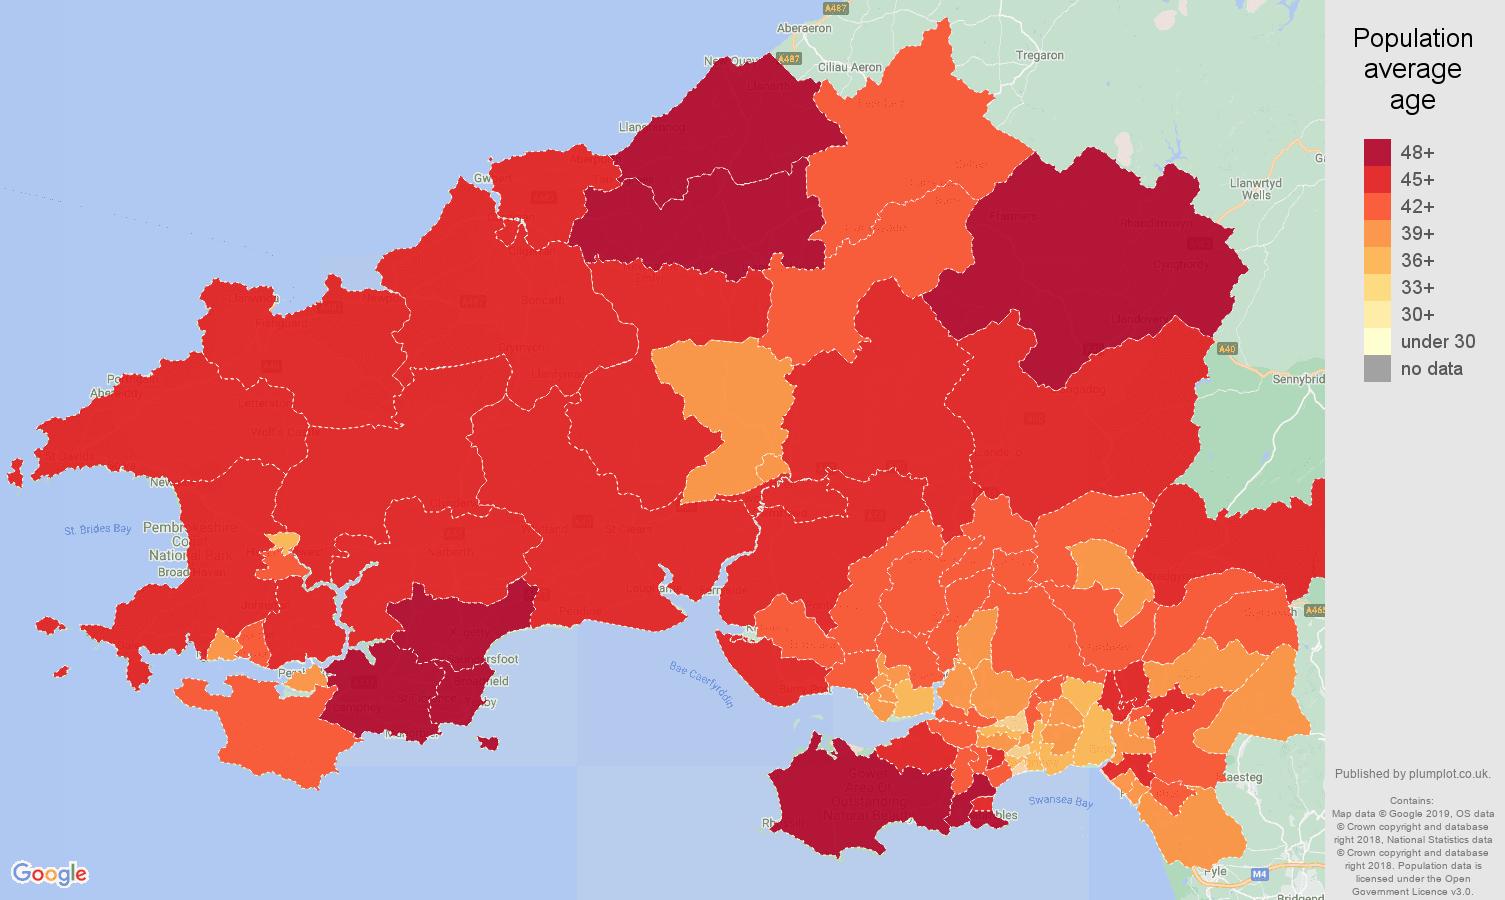 Swansea population average age map